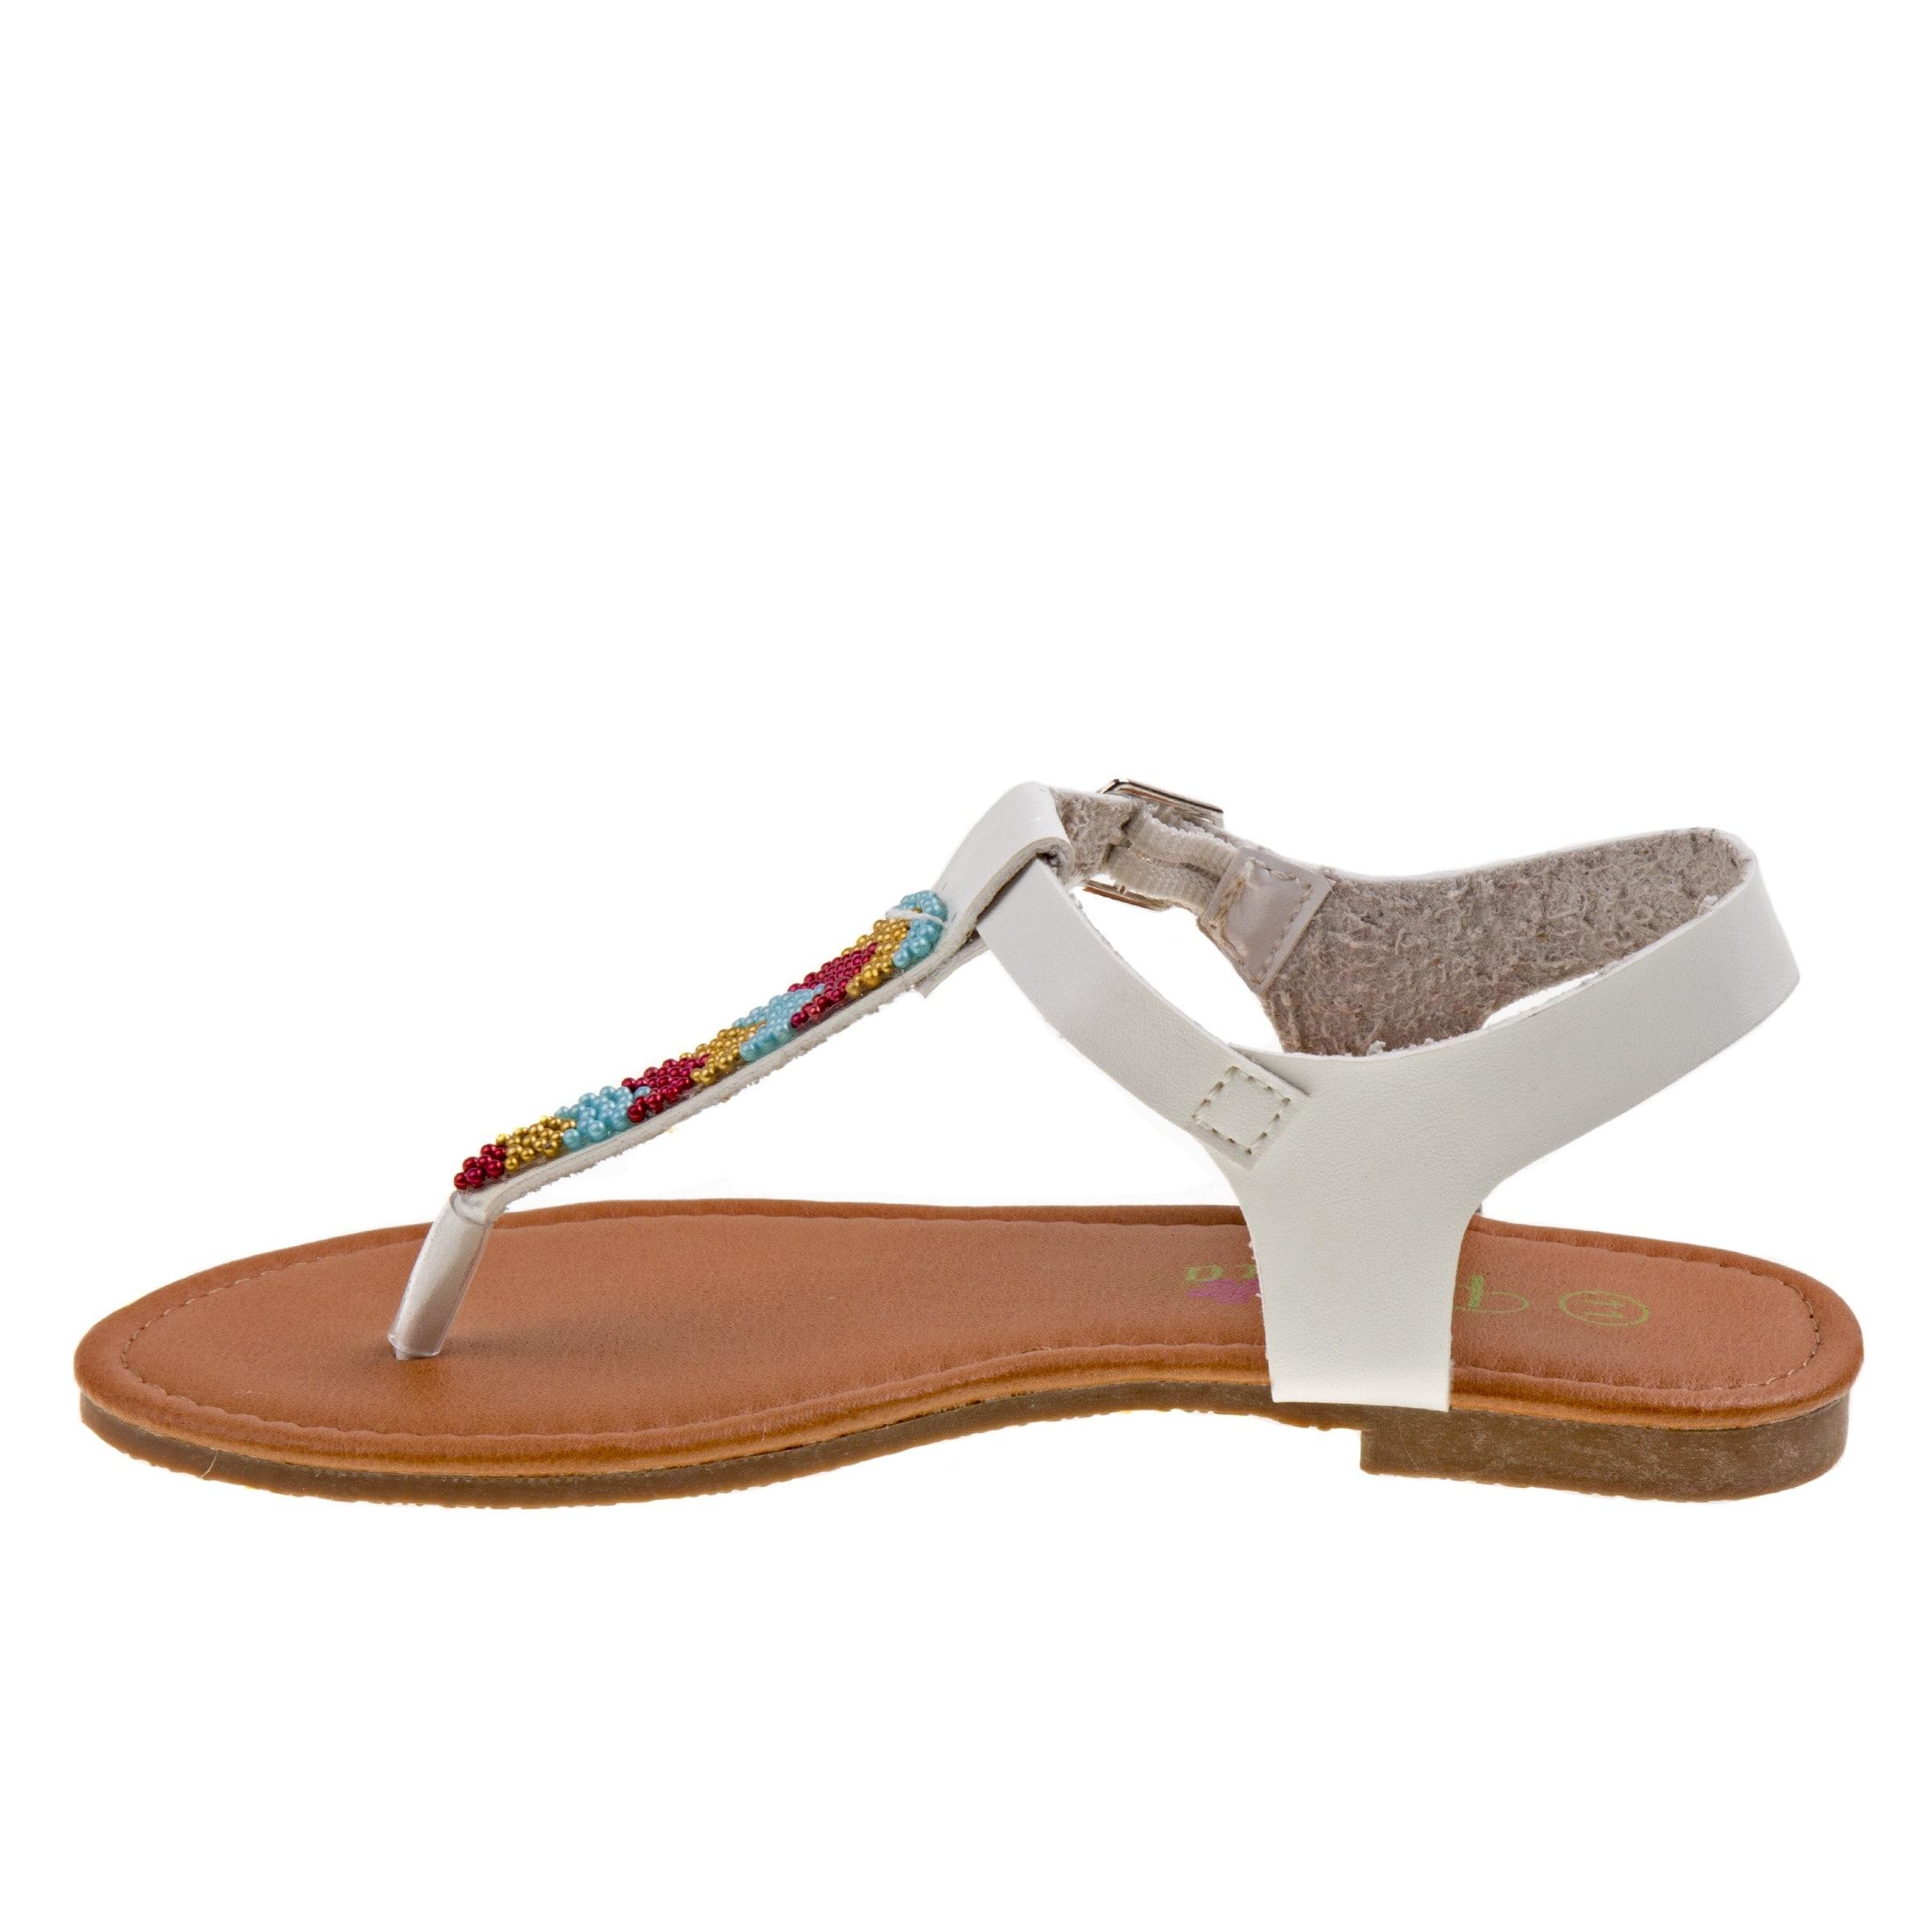 e42050dd9e10 Shop Petalia Little Girls White Multi Color Bead T-Bar Thong Sandals - Free  Shipping On Orders Over  45 - Overstock - 25723809